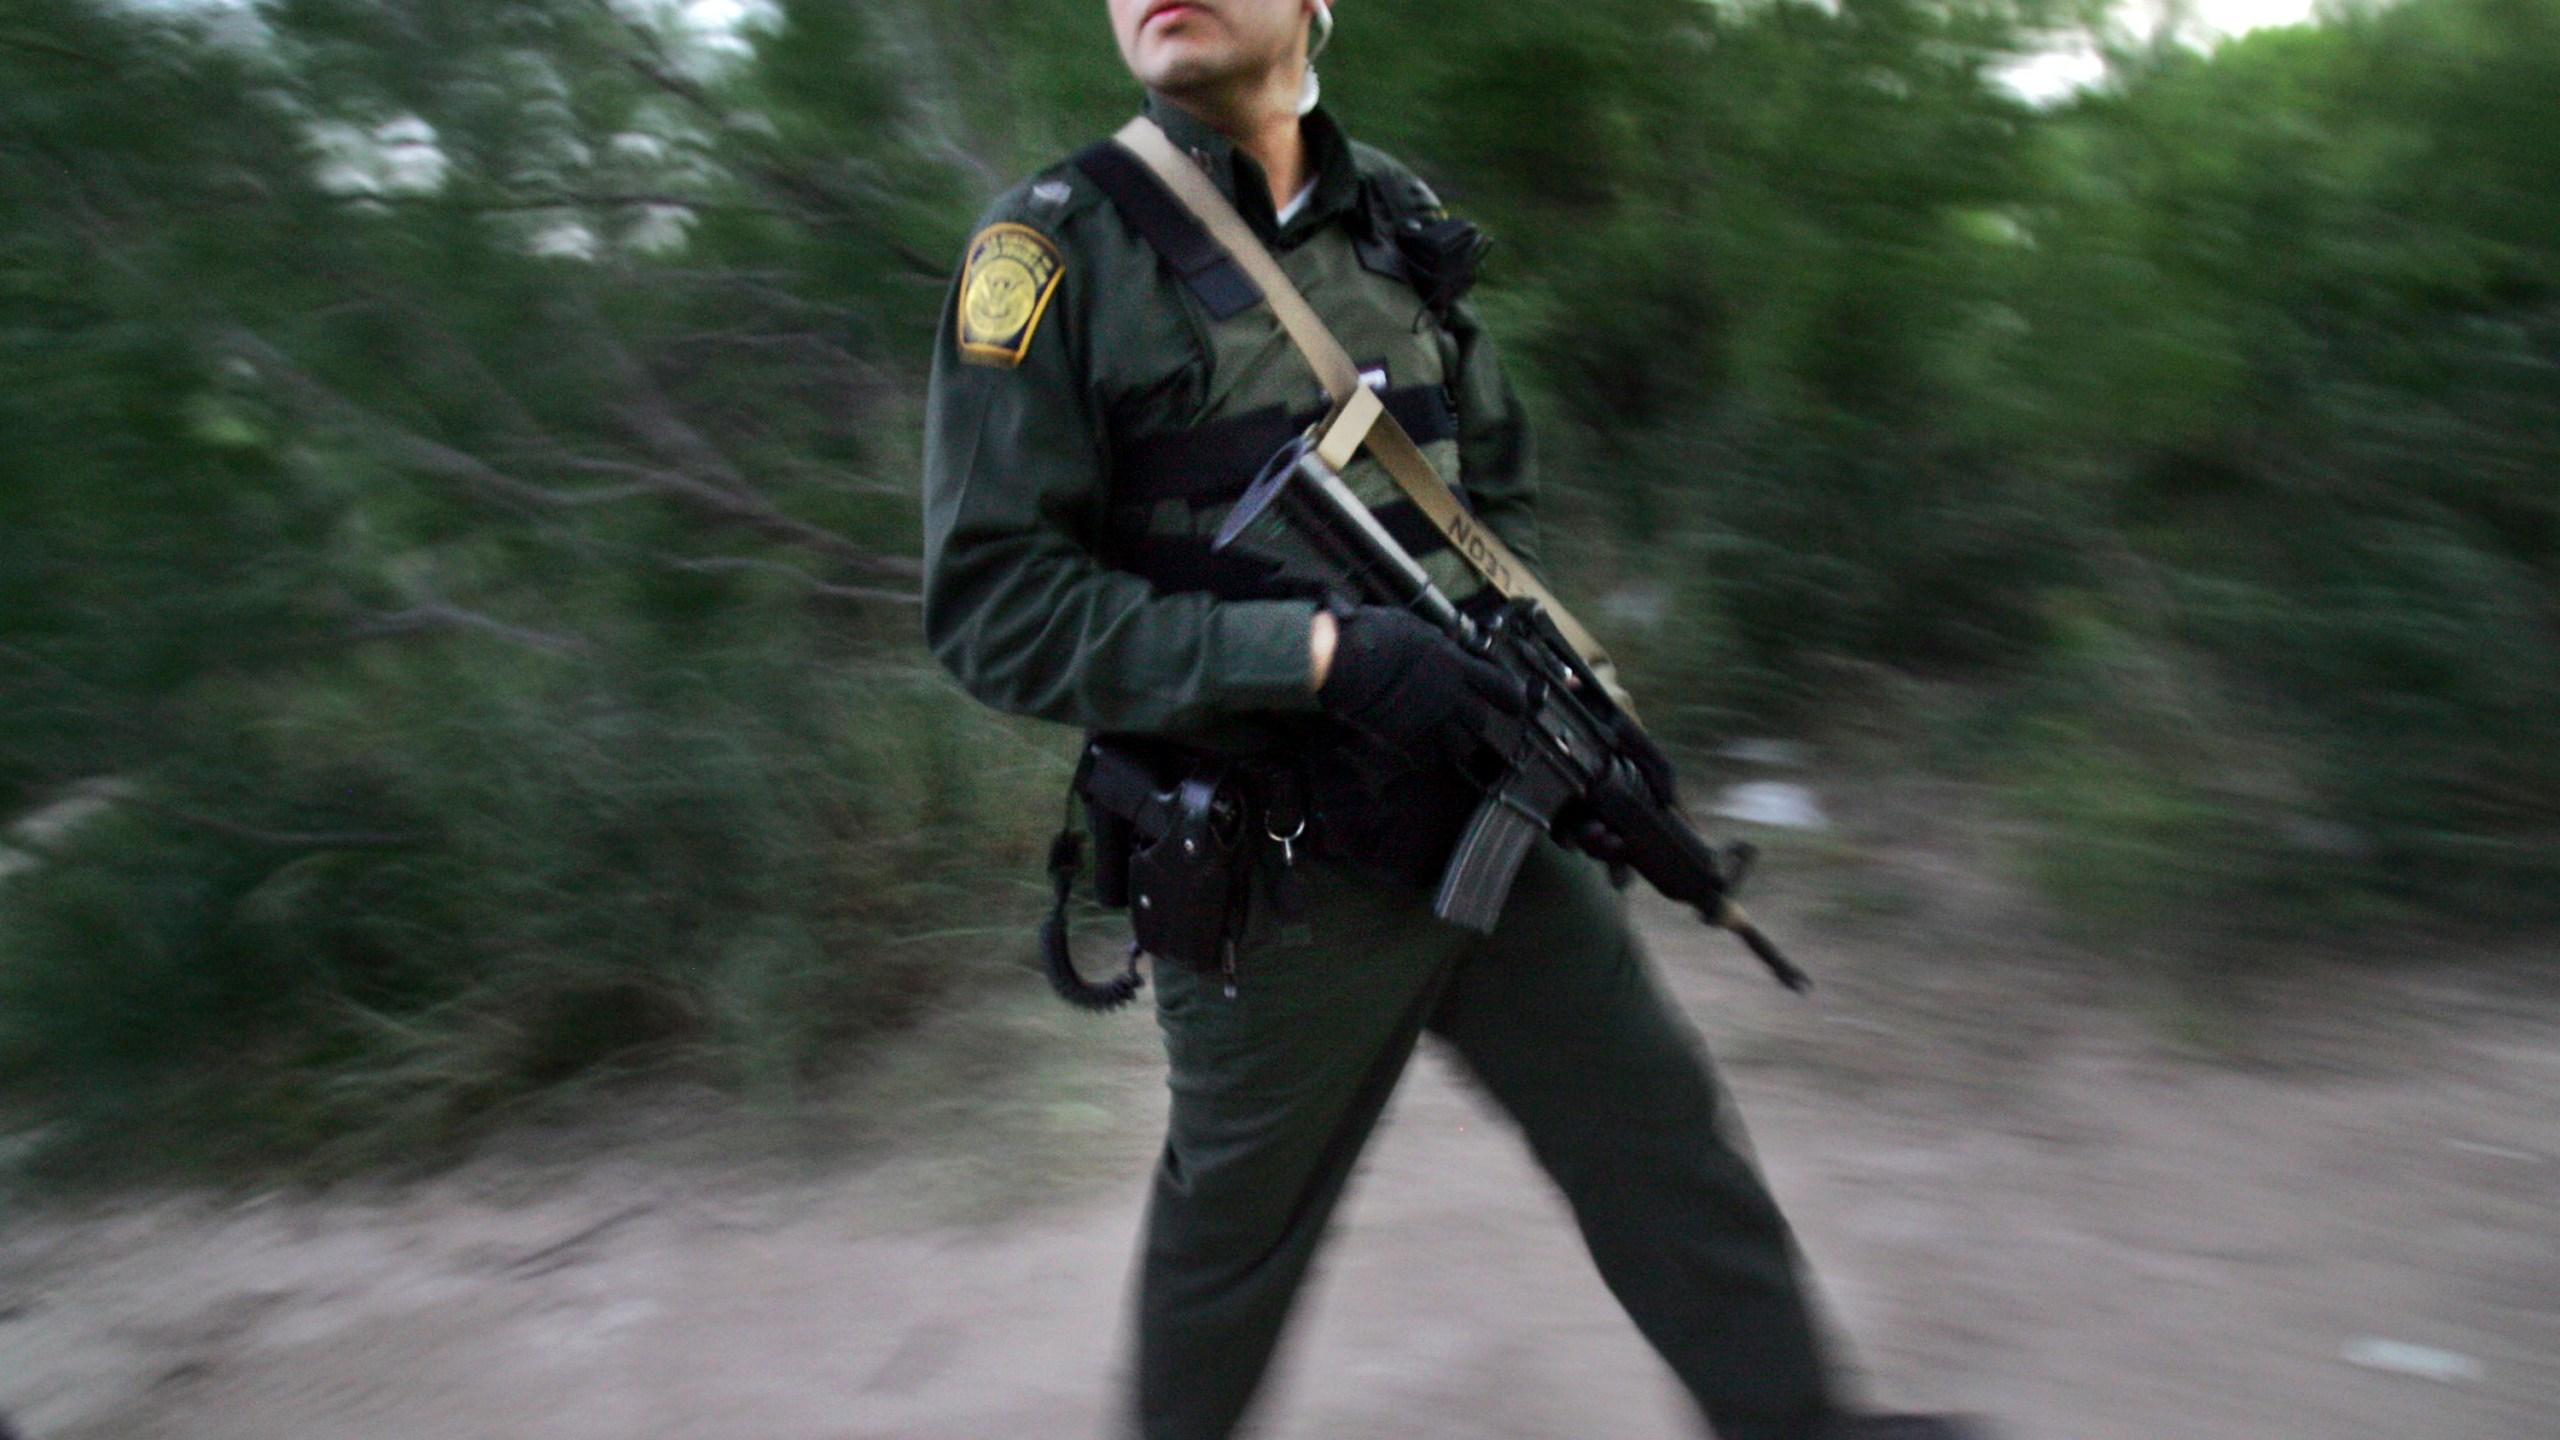 AP_Explains-Border-Militarization_23331-159532.jpg25545535